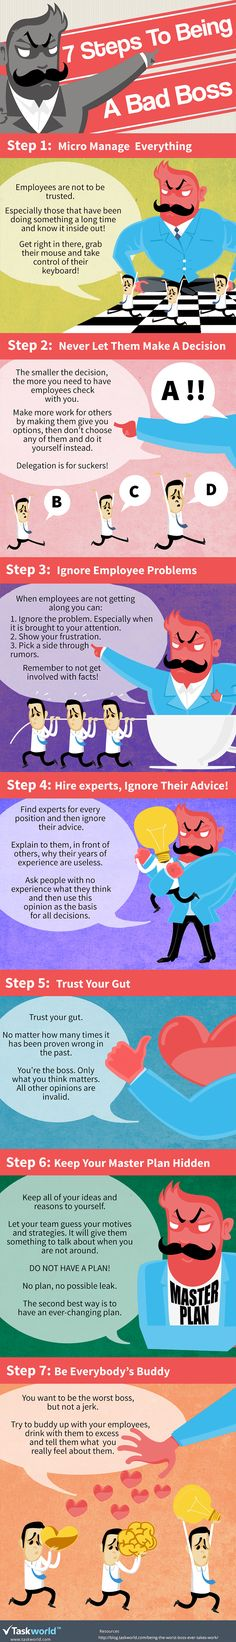 Haha this rules! Do Hungarian women!